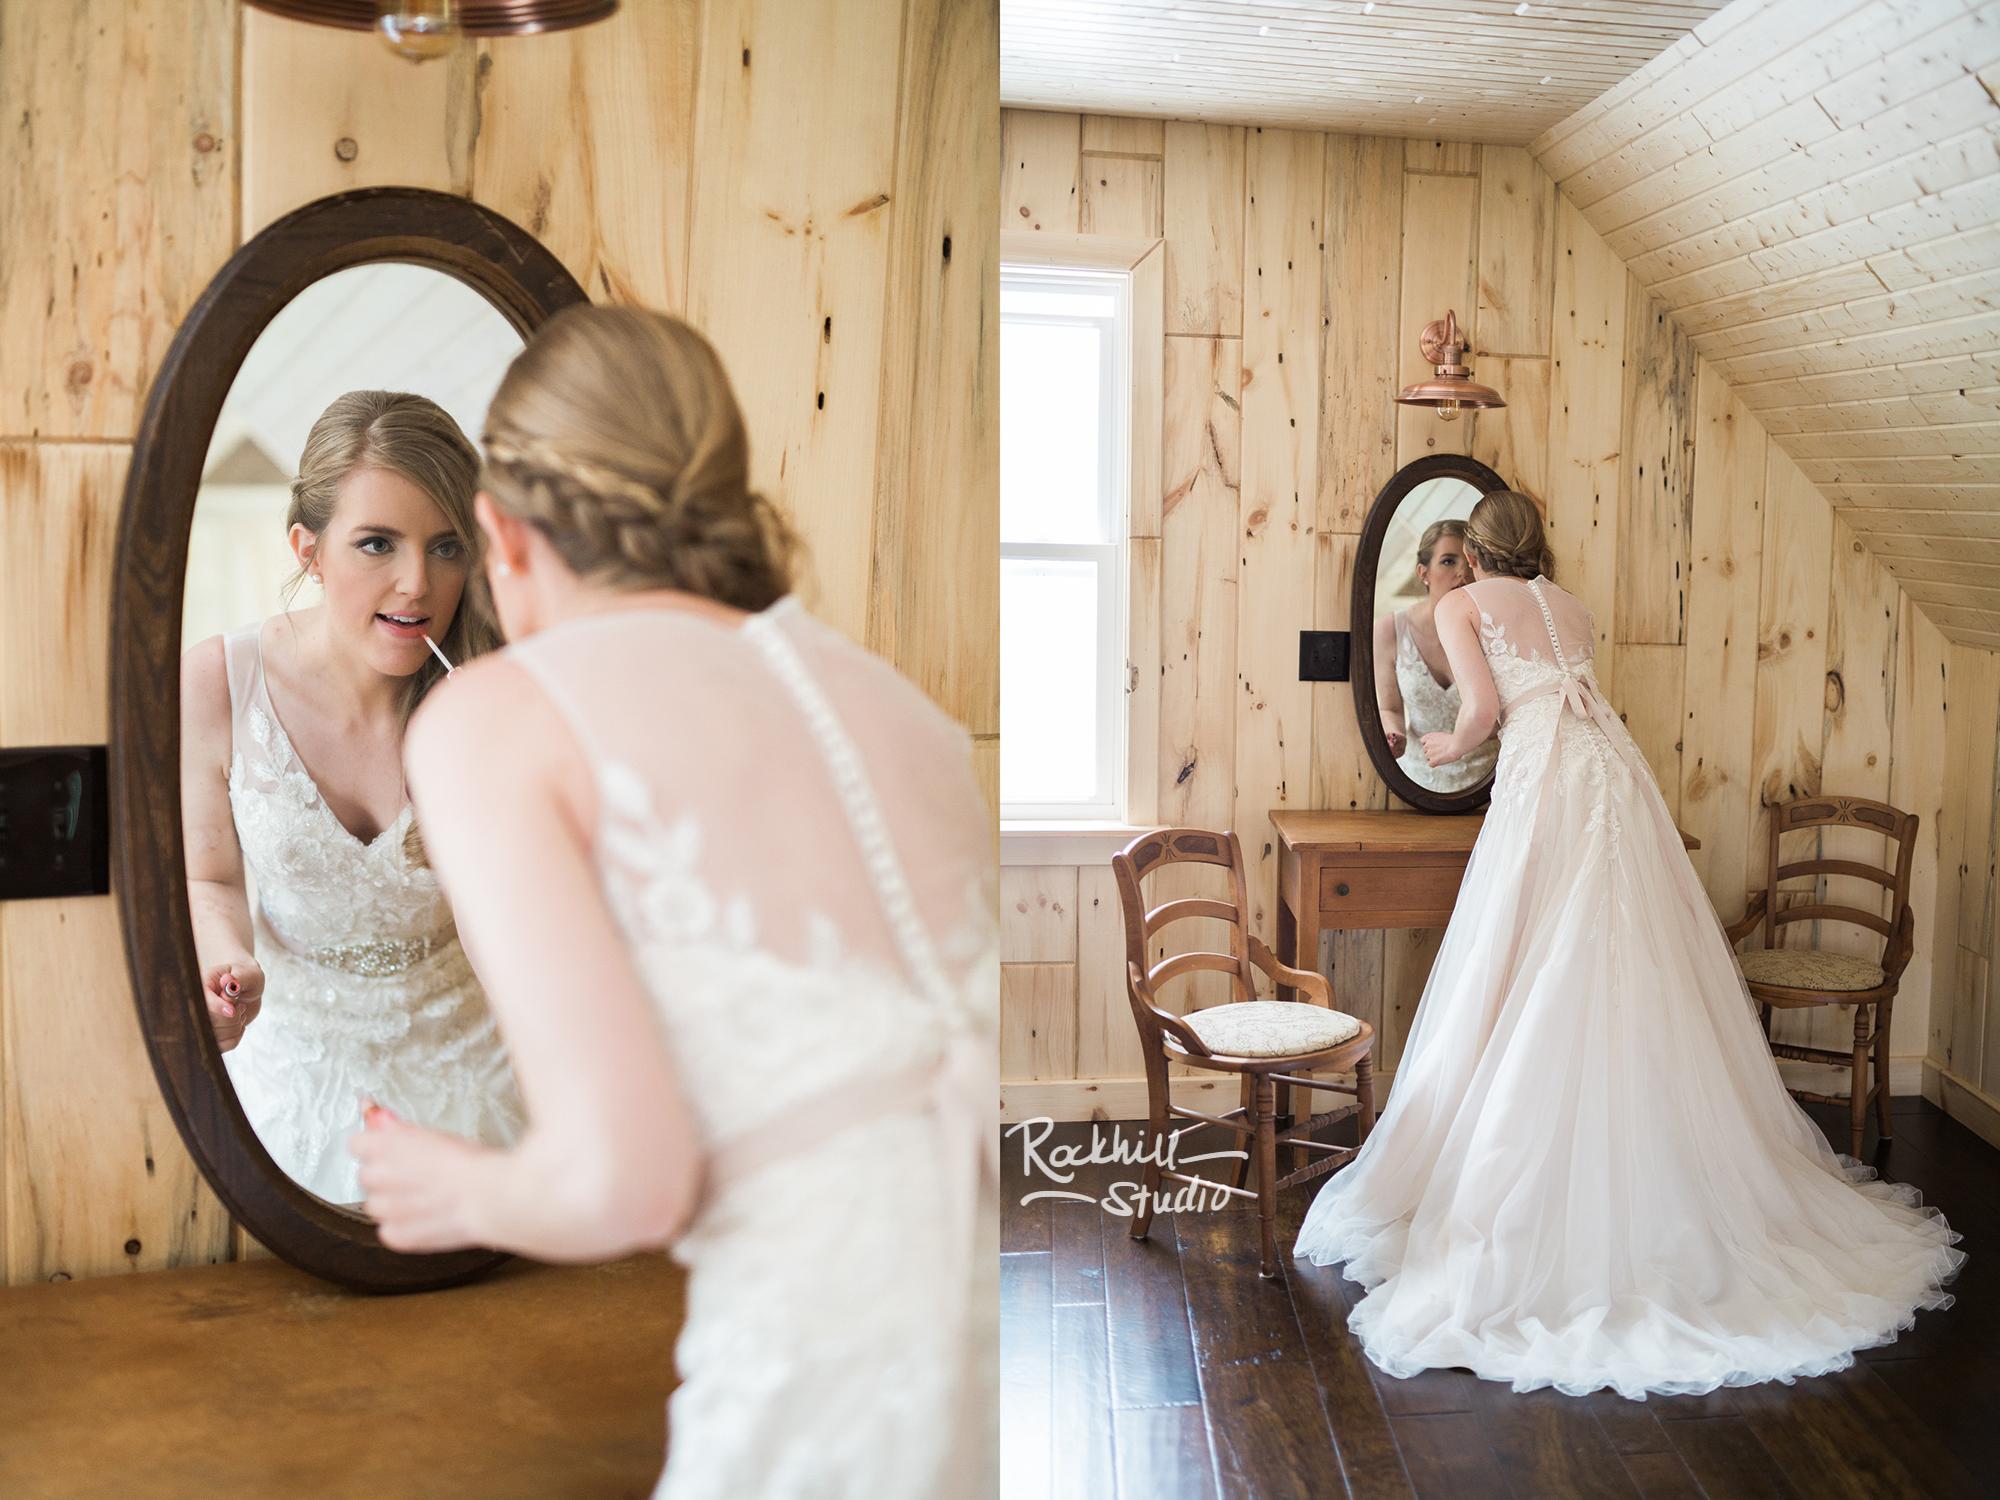 newberry-michigan-wedding-upper-peninsula-spring-photography-rockhill-ee-15.jpg